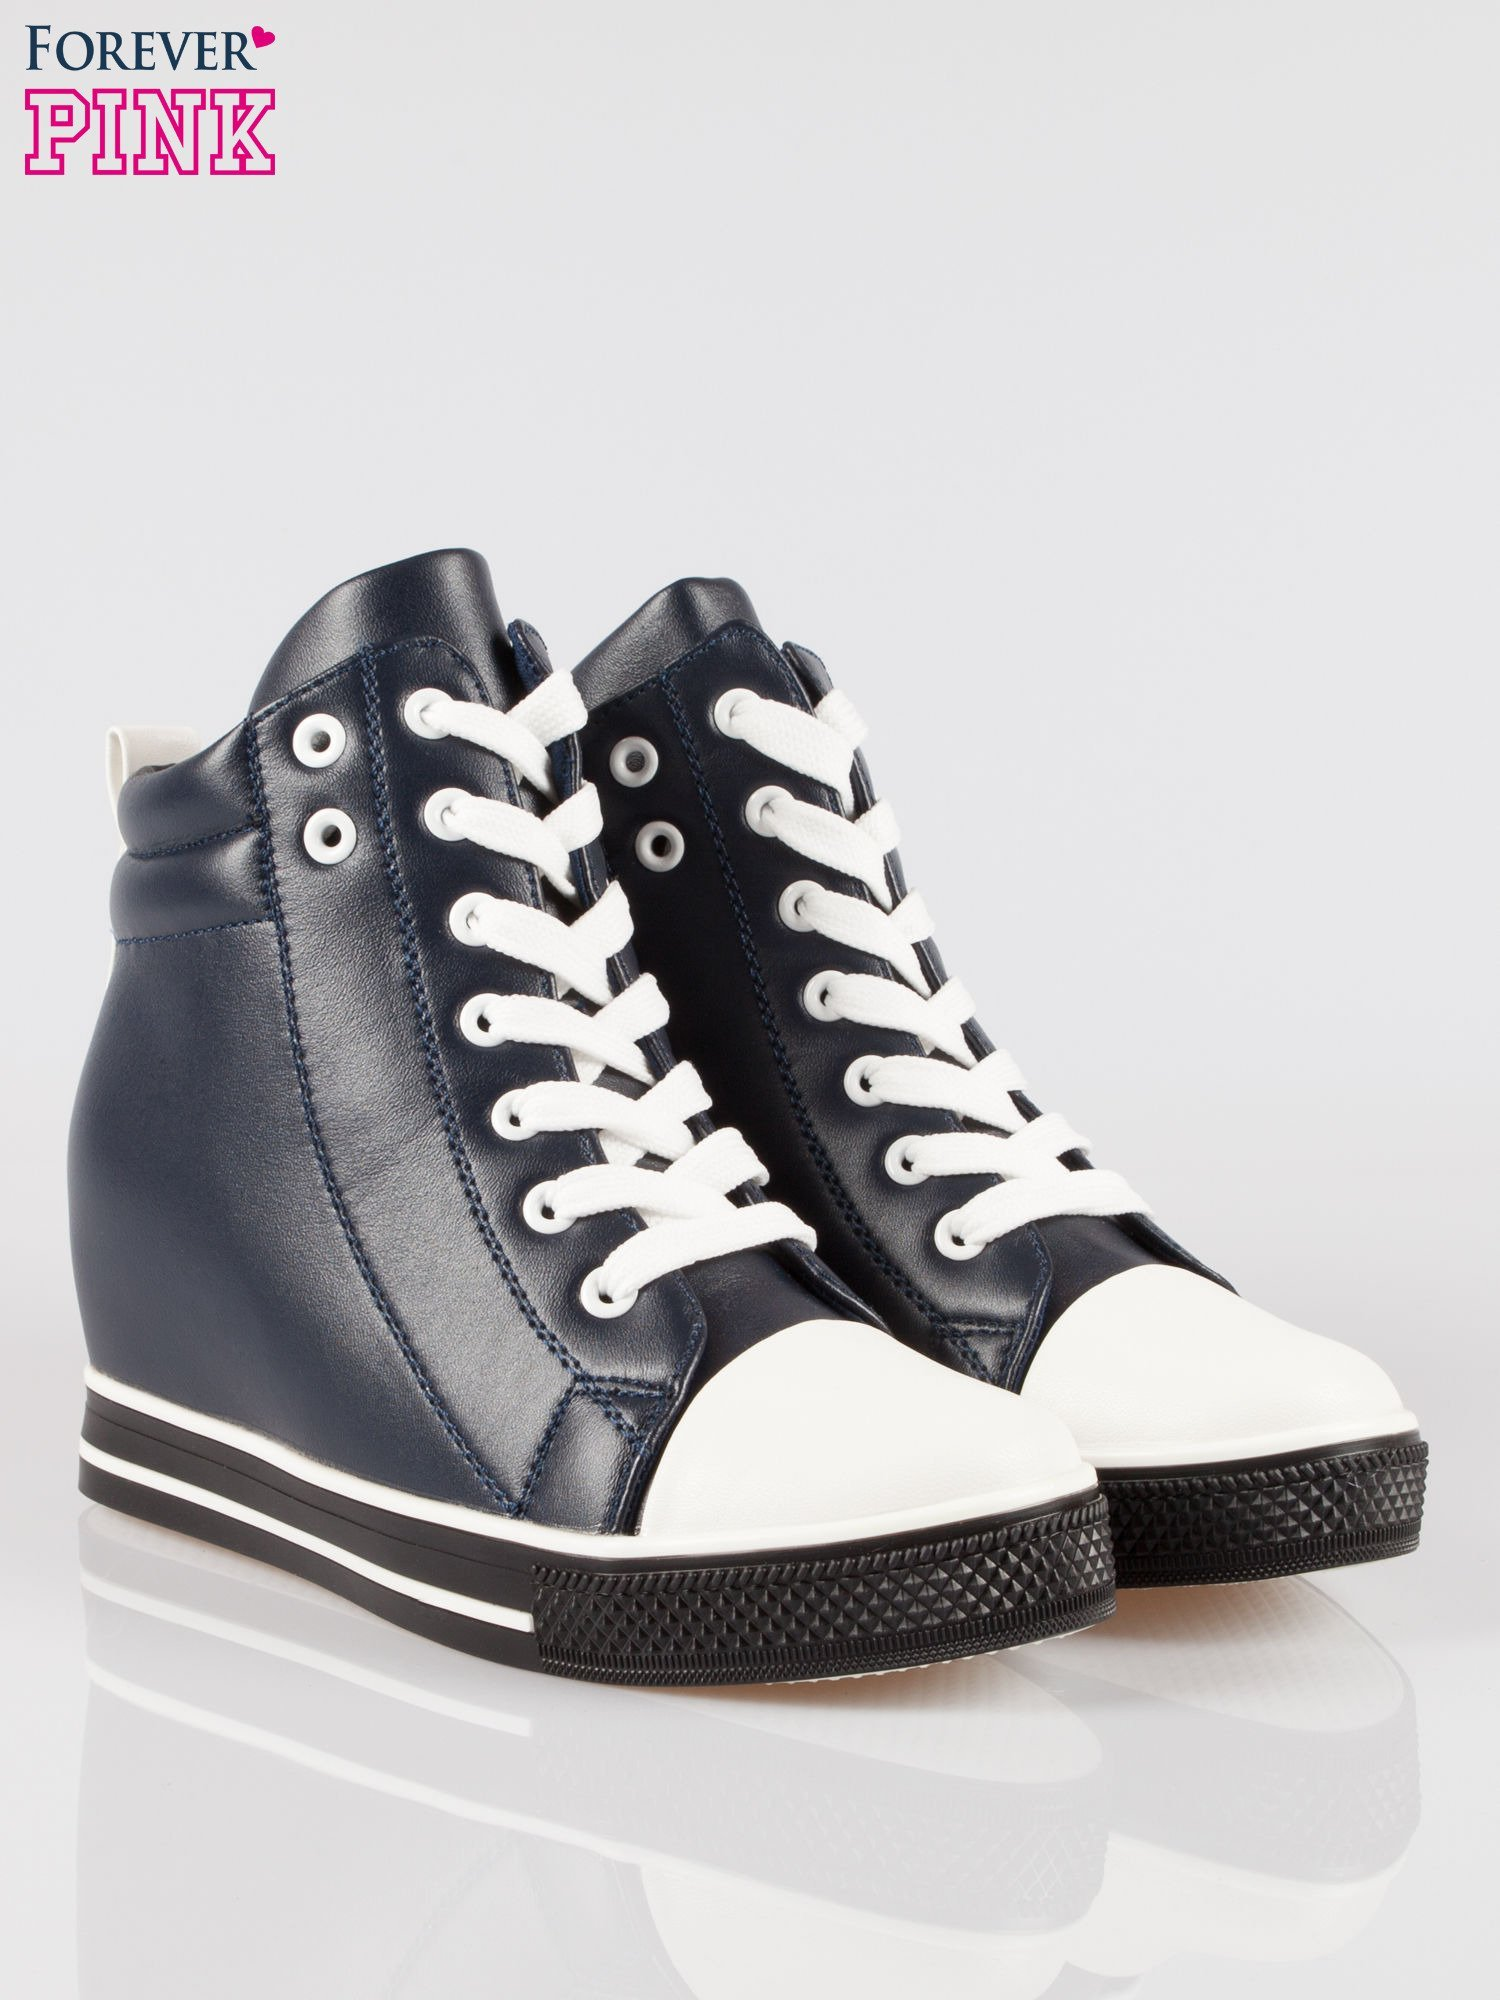 Cienoniebieskie sneakersy trampki cap toe na koturnie                                  zdj.                                  2